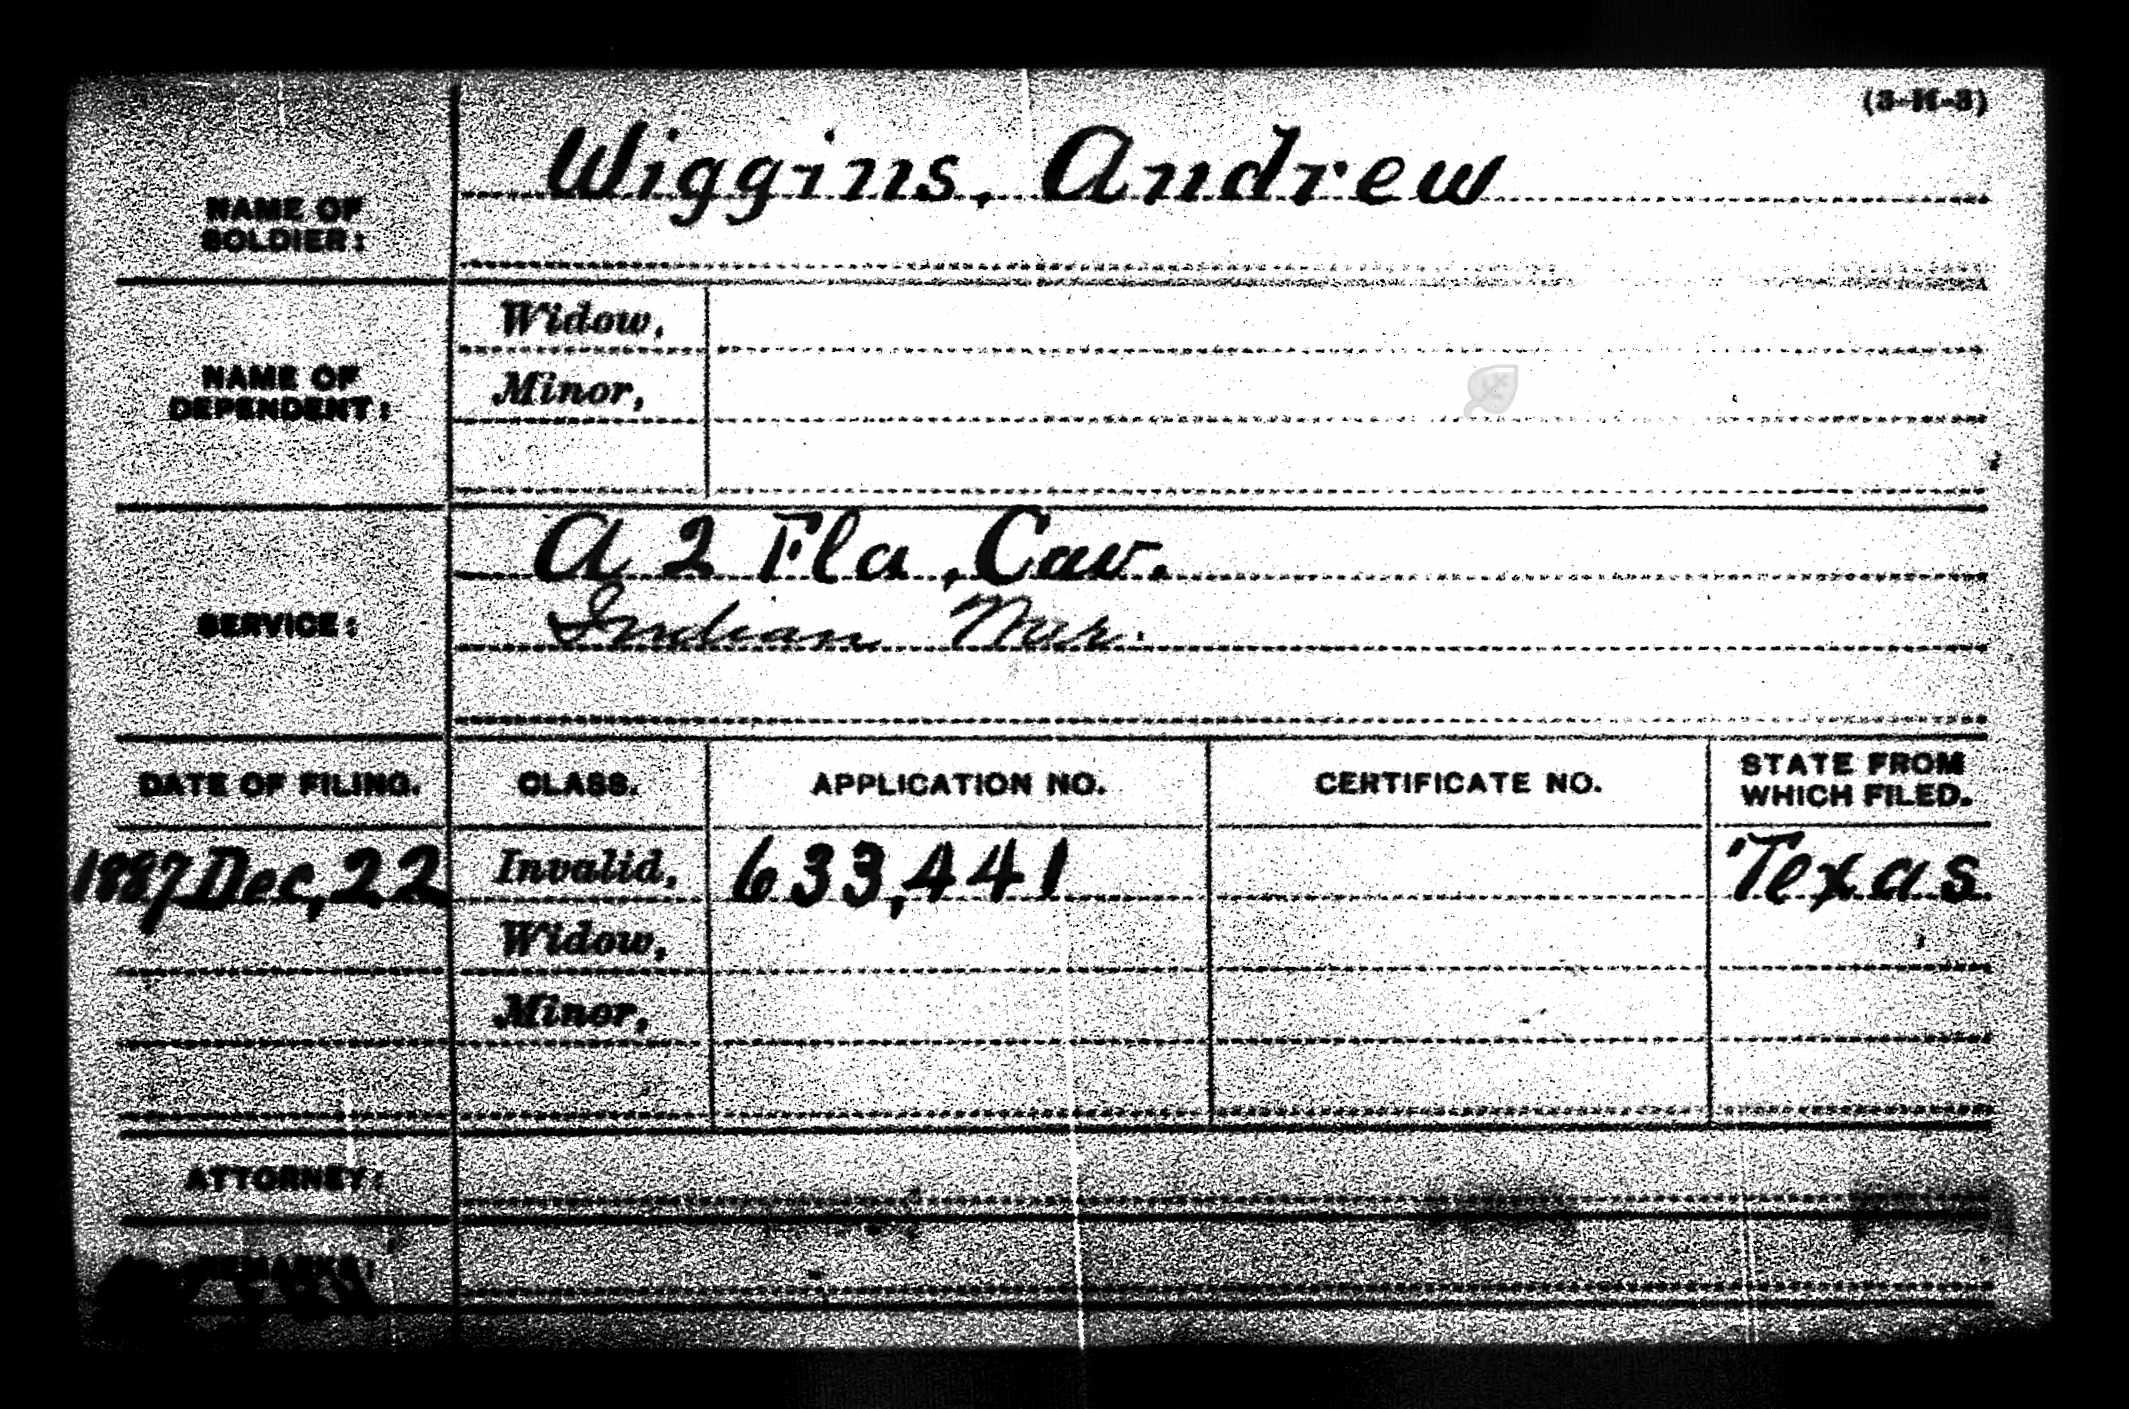 Andrew Jackson Wiggins